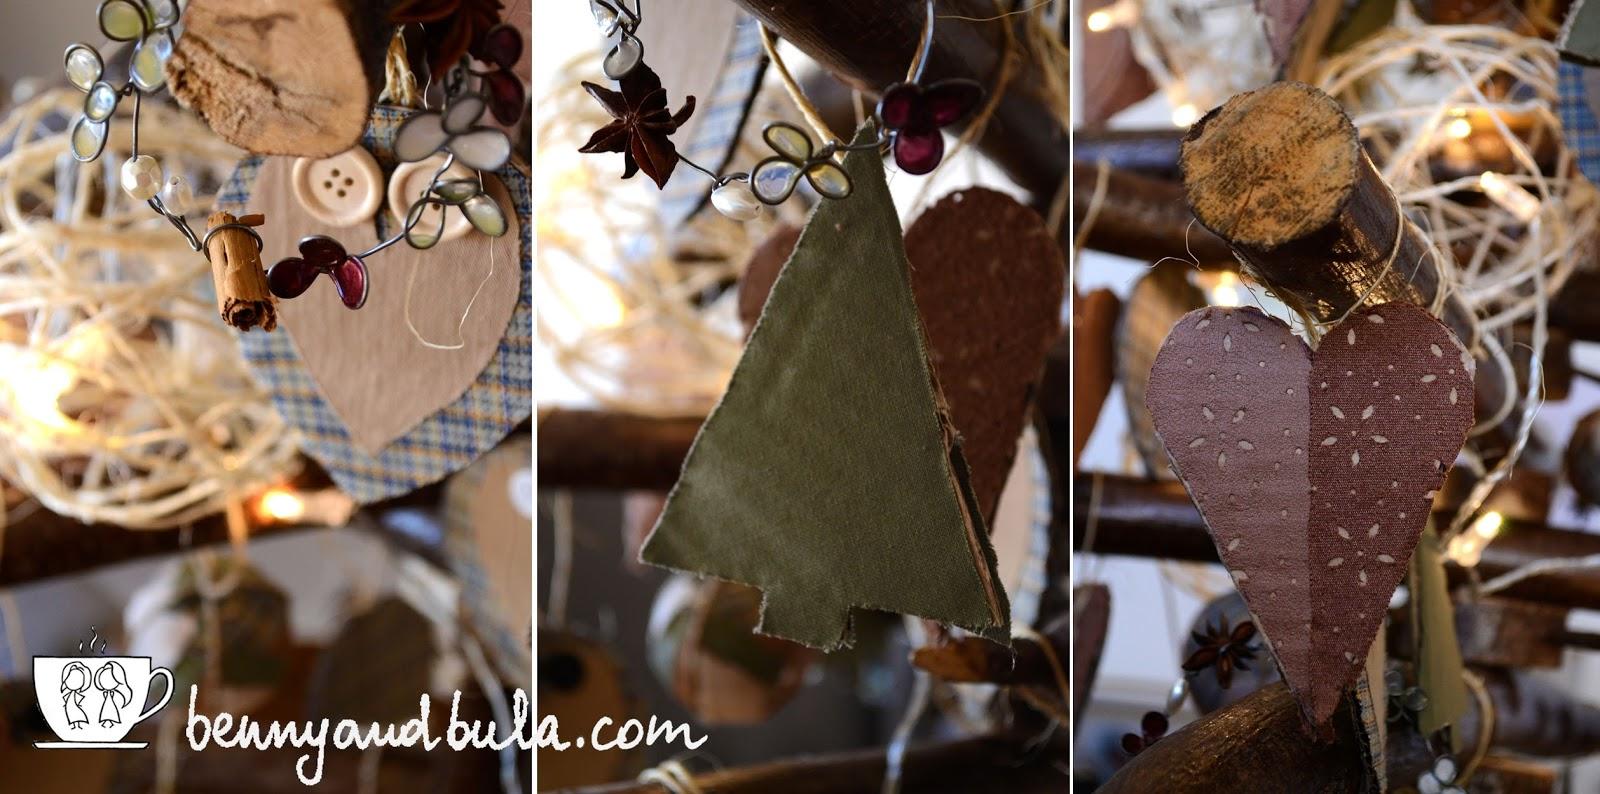 Albero di Natale fai da te/DIY Christmas Tree tutorial